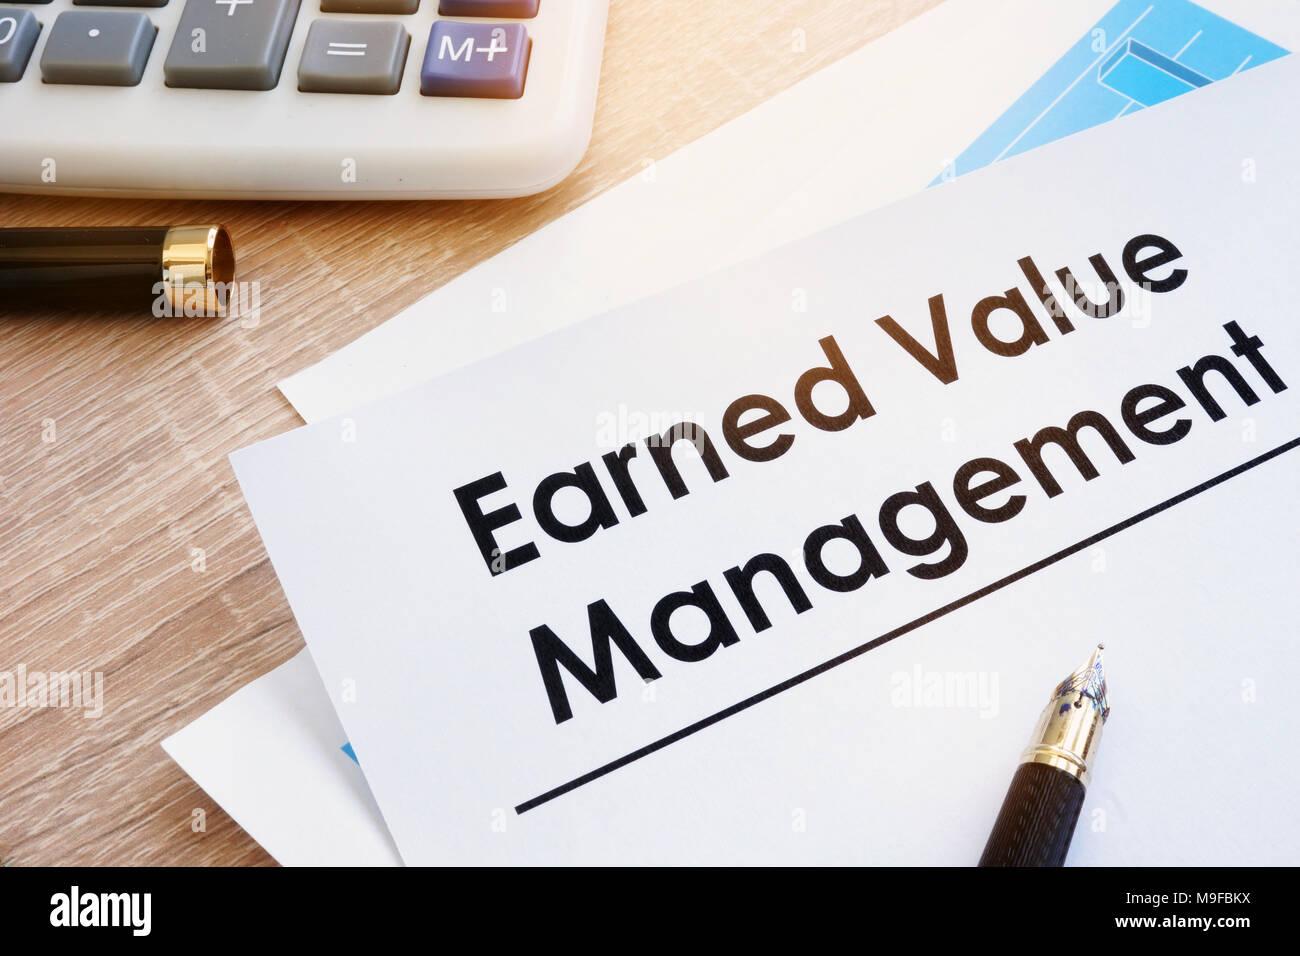 Document Earned Value Management on a desk. - Stock Image